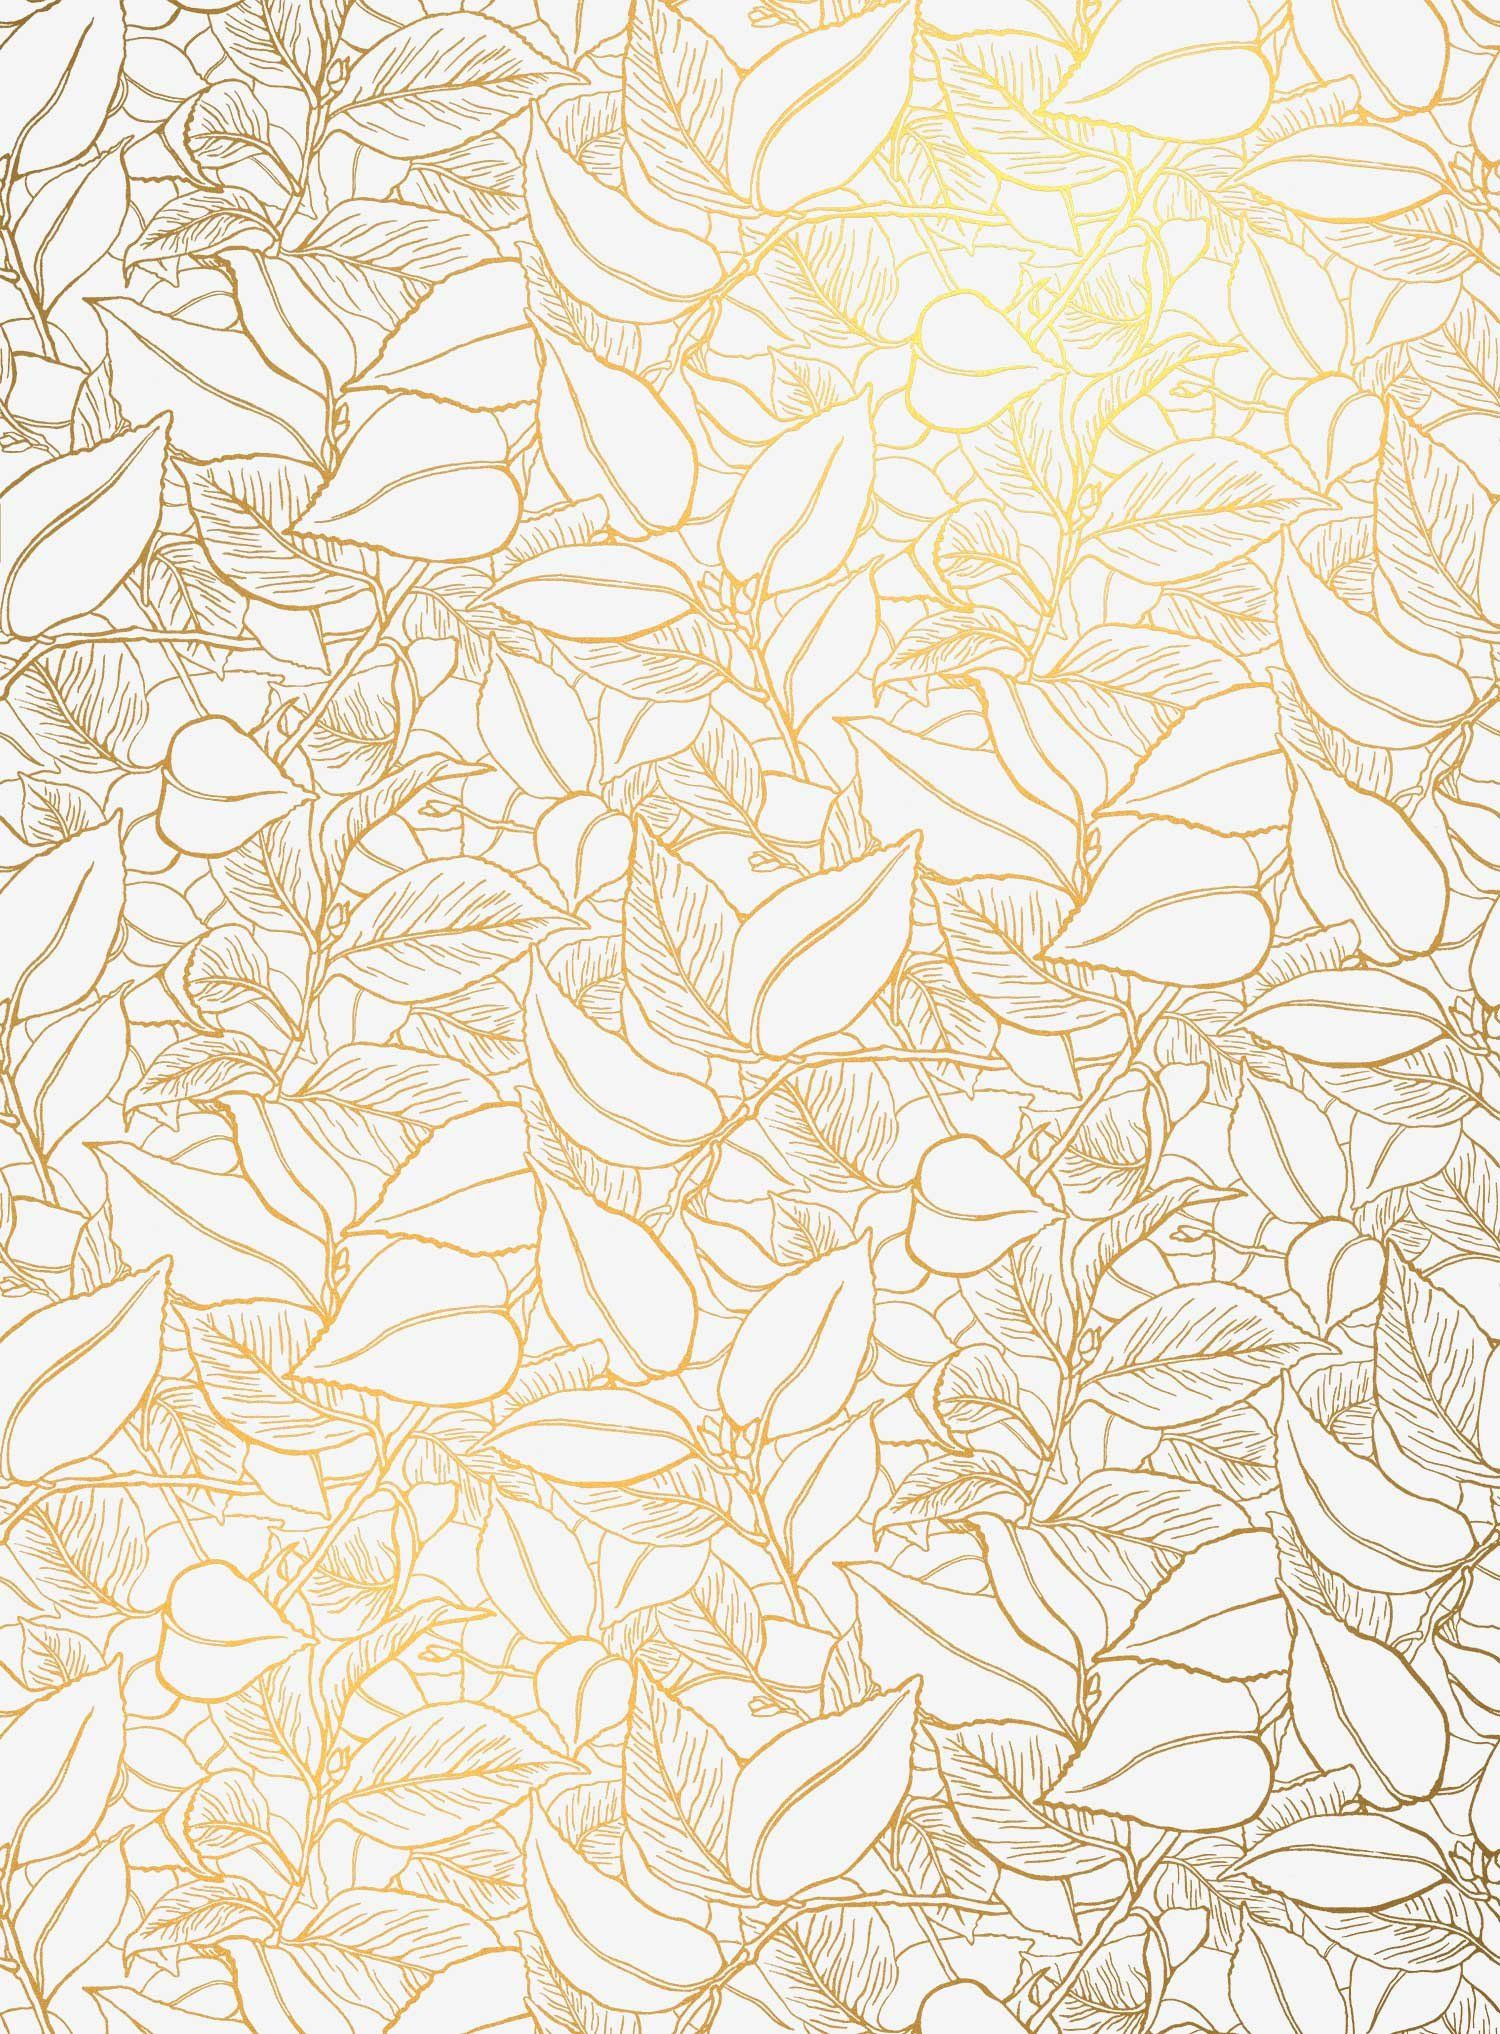 Garden Wall Vellum Lake August Floral Wallpaper Vintage Flowers Wallpaper White And Gold Wallpaper